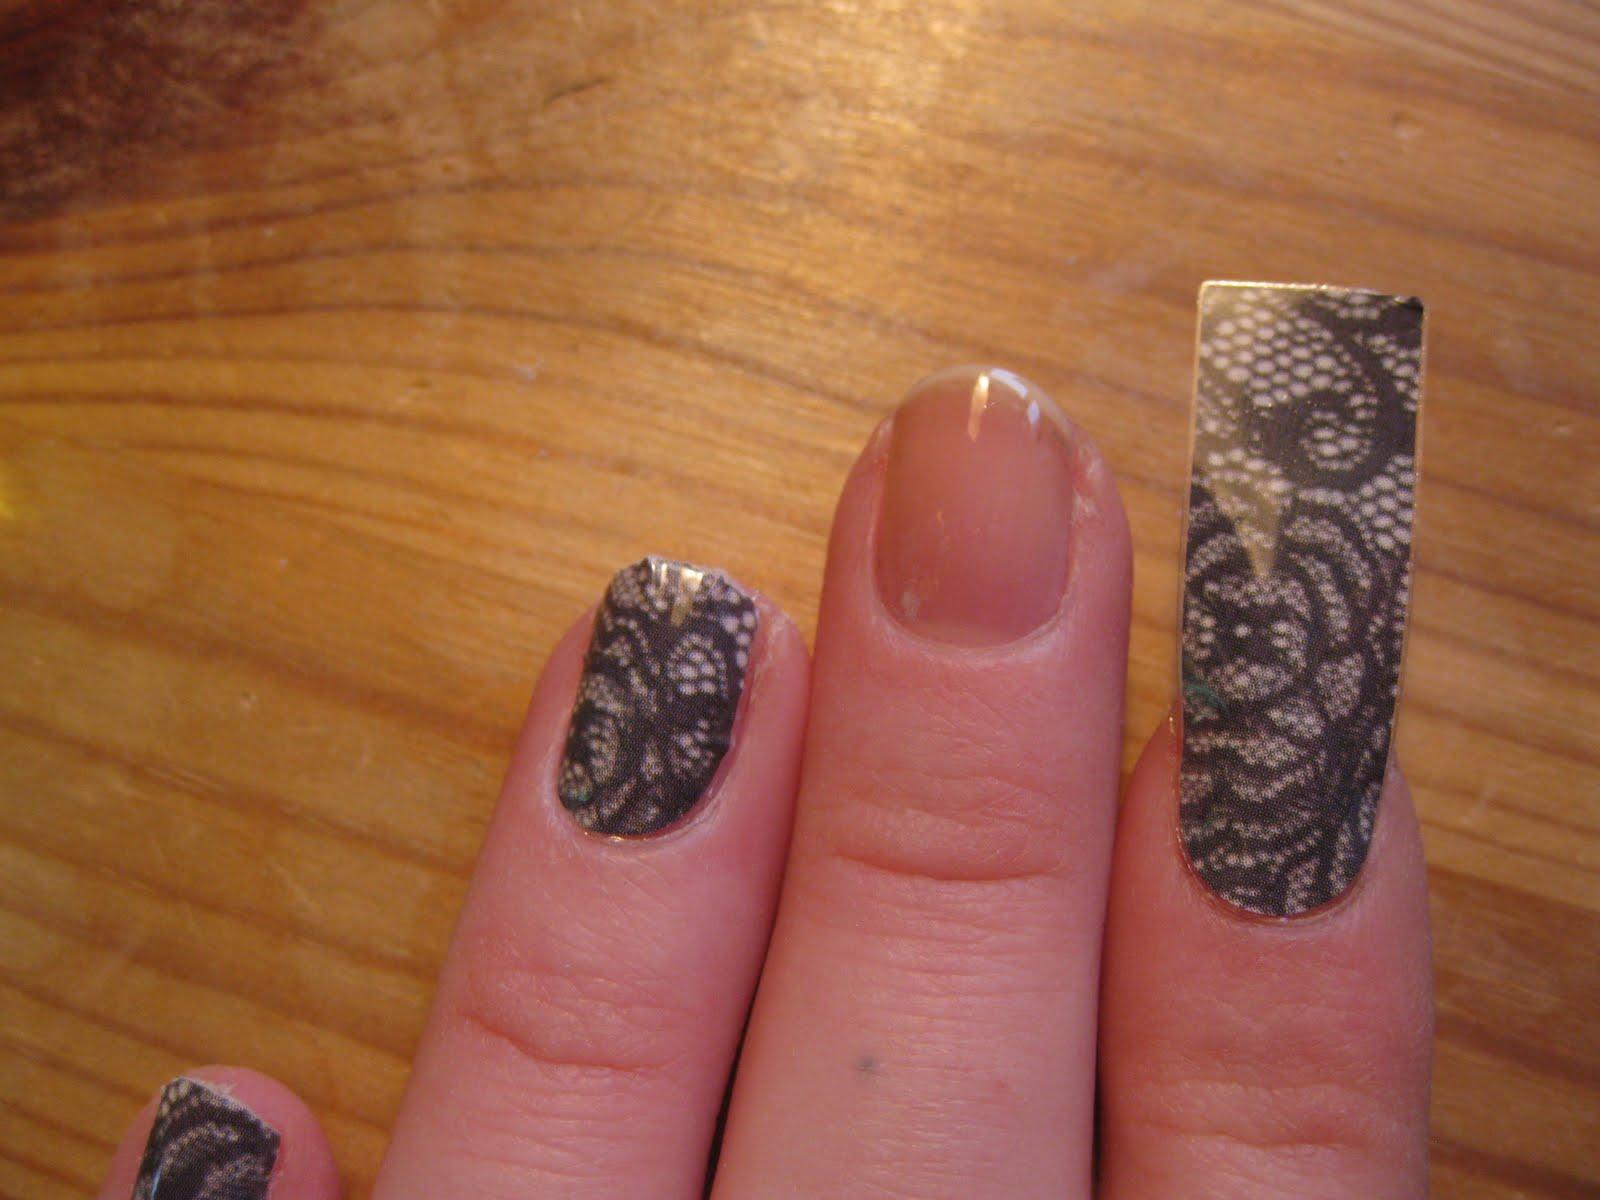 Sandra\'s Nails (not active anymore): Wild & Mild Full Nail Stickers